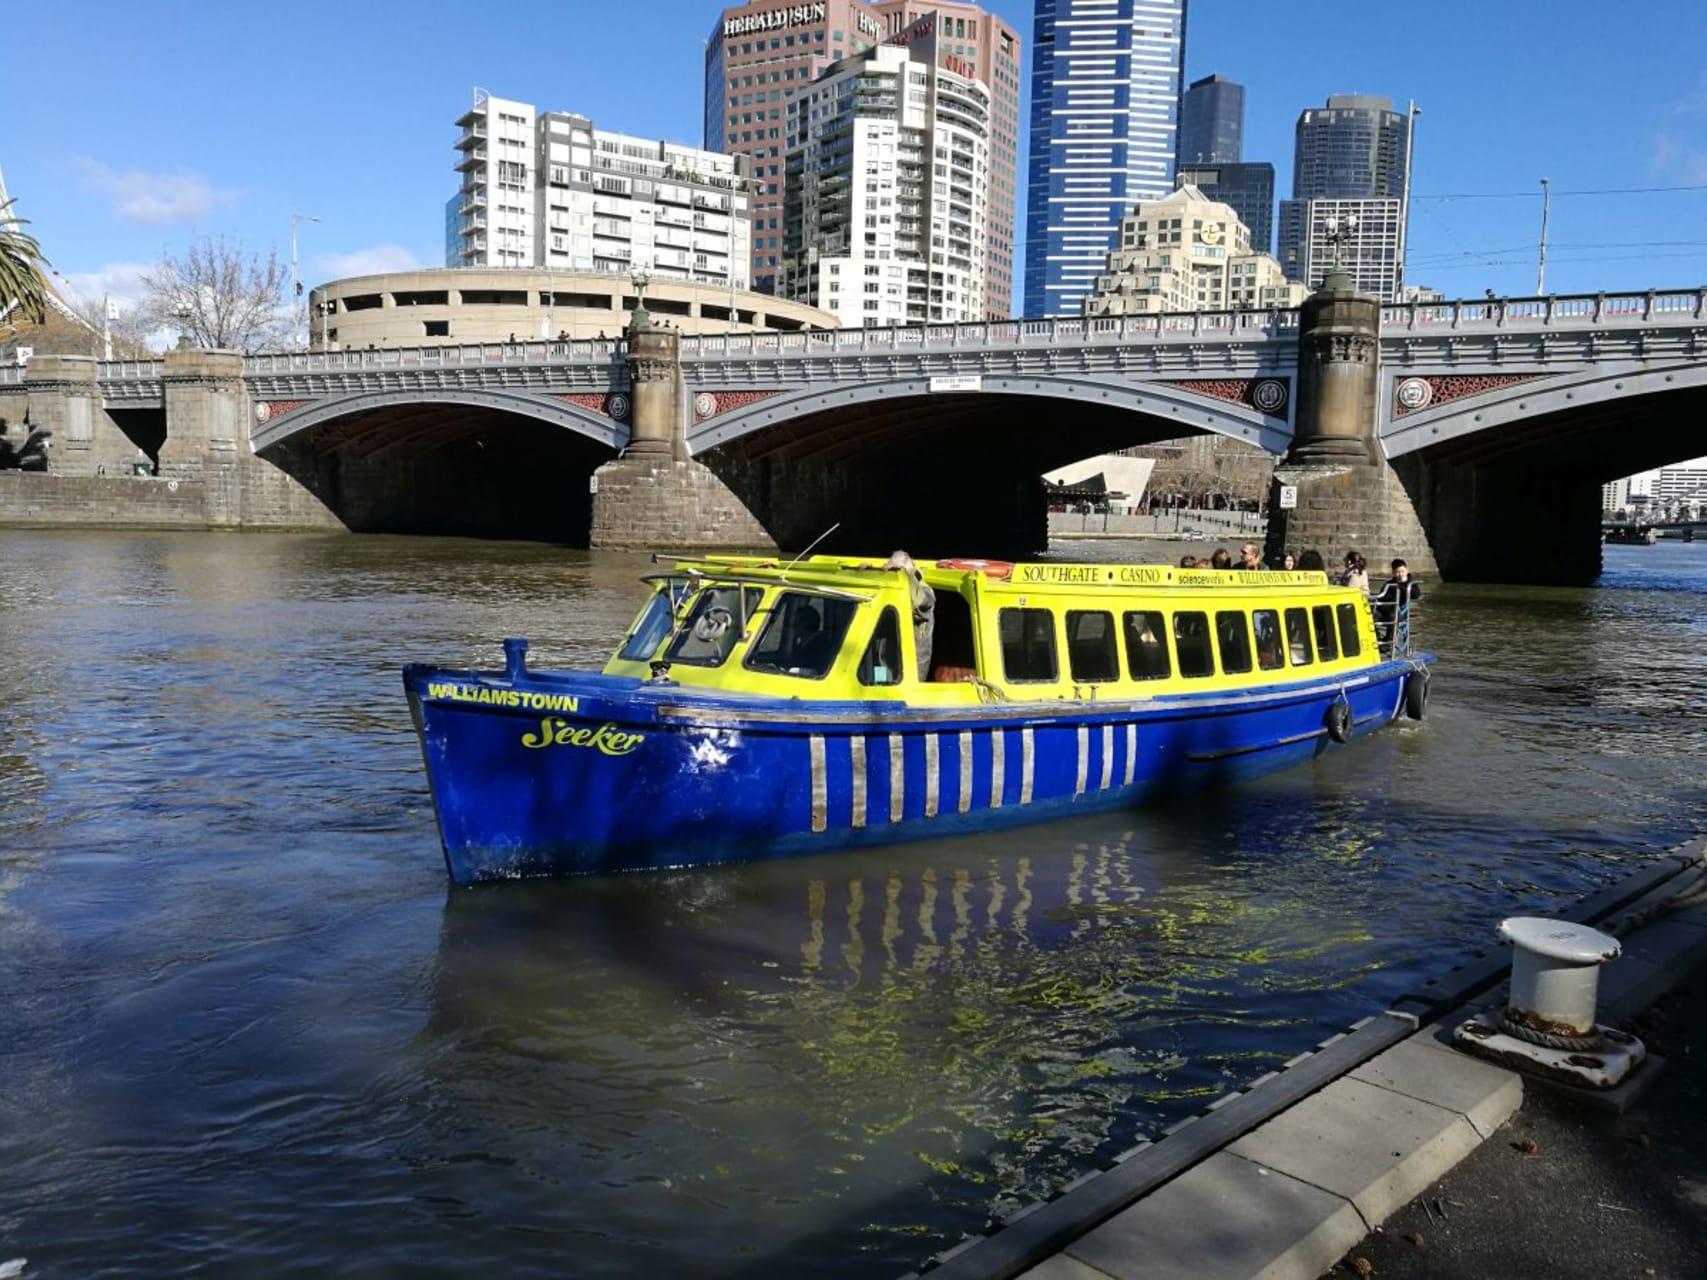 Melbourne - Williamstown Ferry